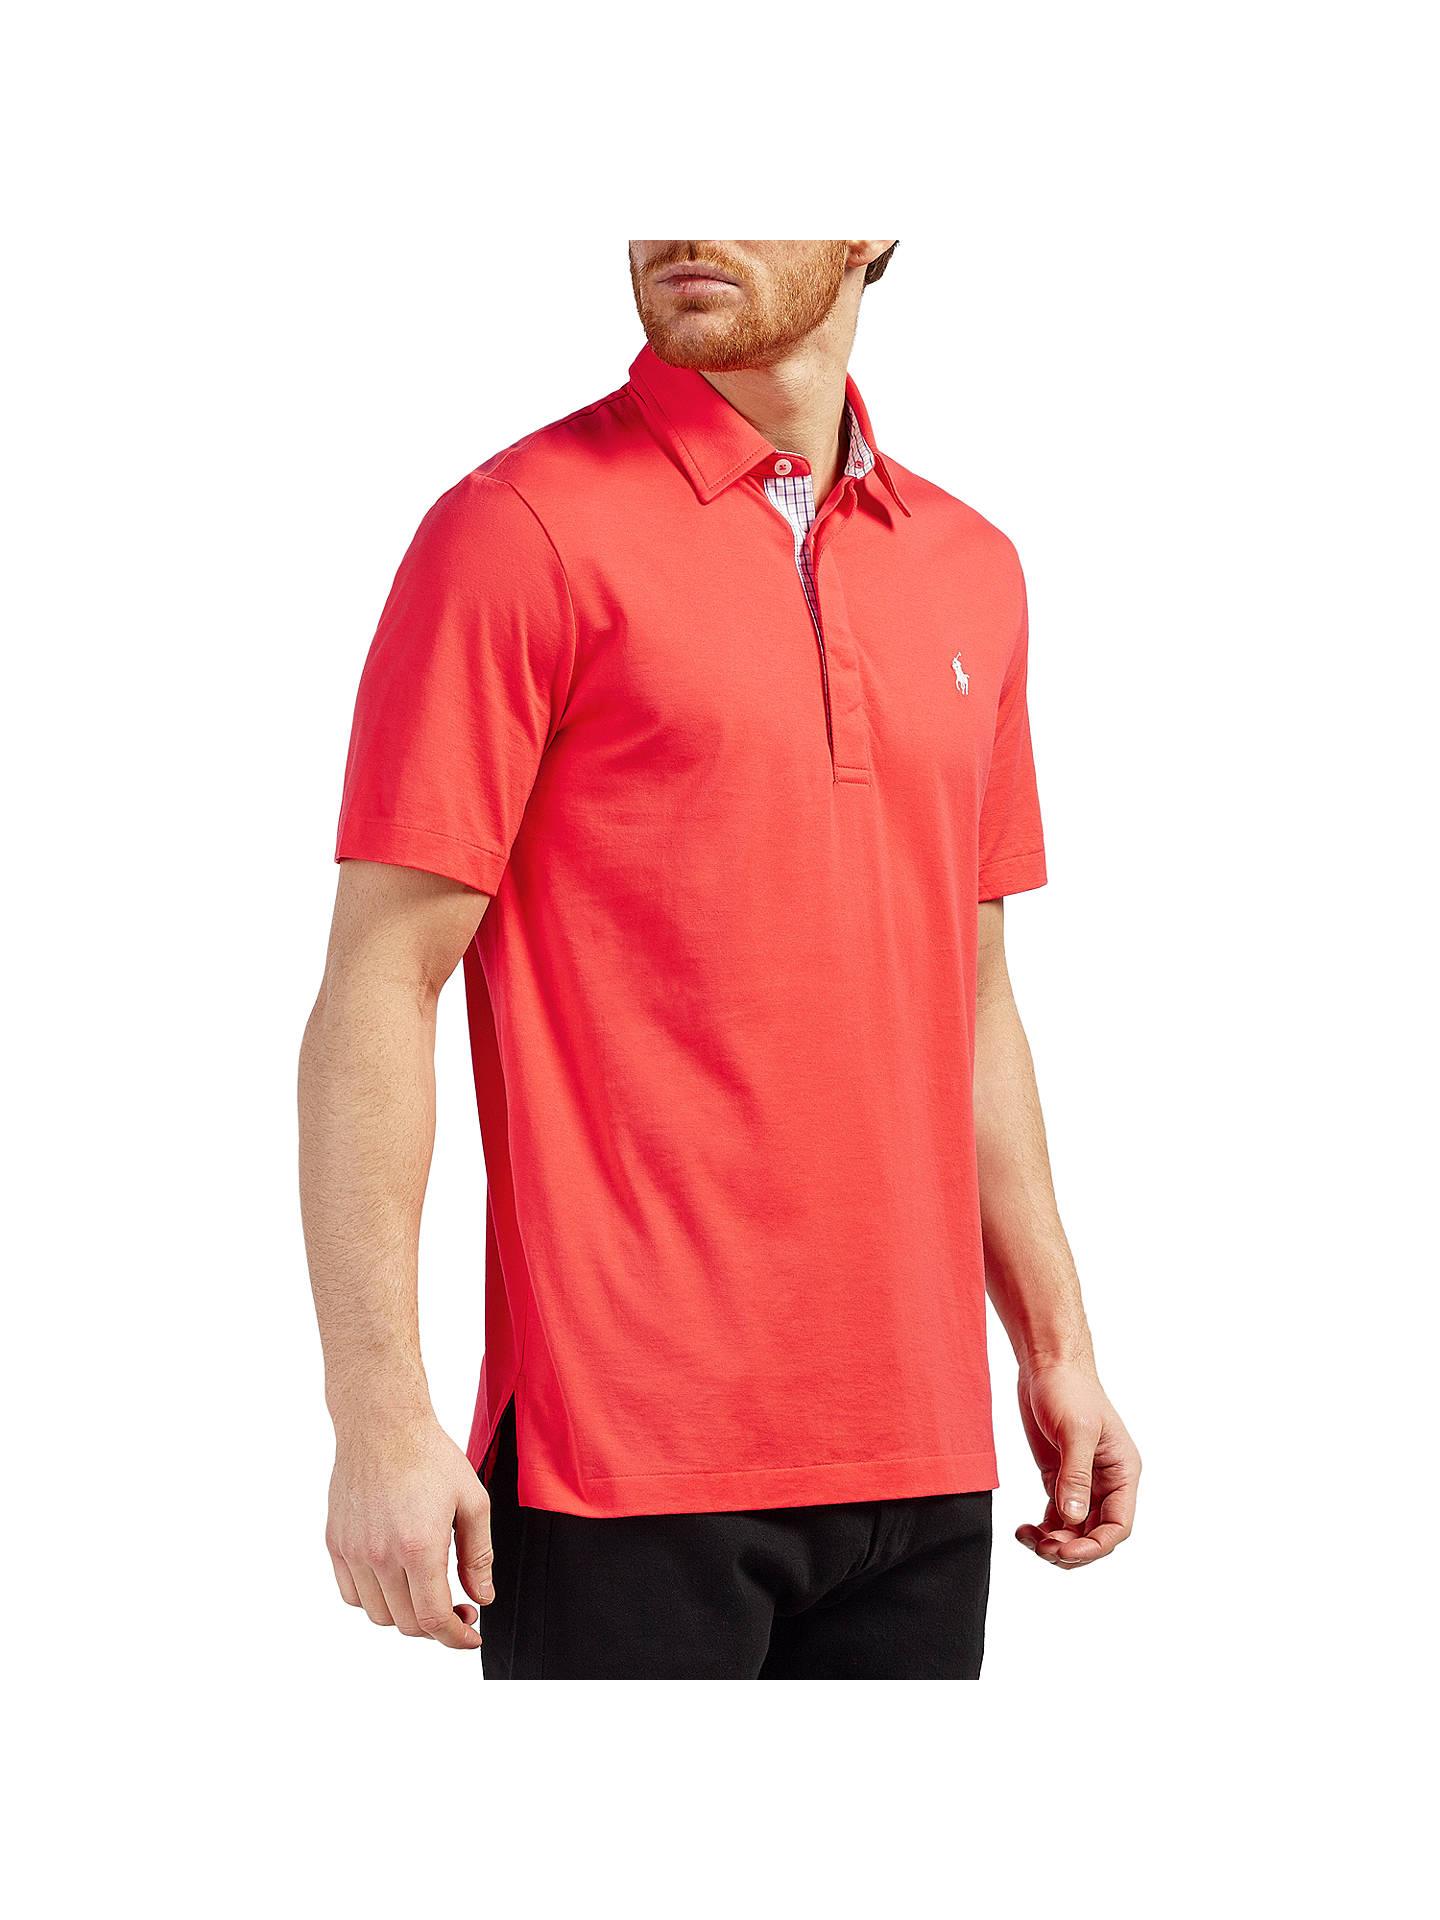 fcff2dc8fc5 Polo Golf by Ralph Lauren Vintage Lisle Pima Cotton Polo Shirt ...